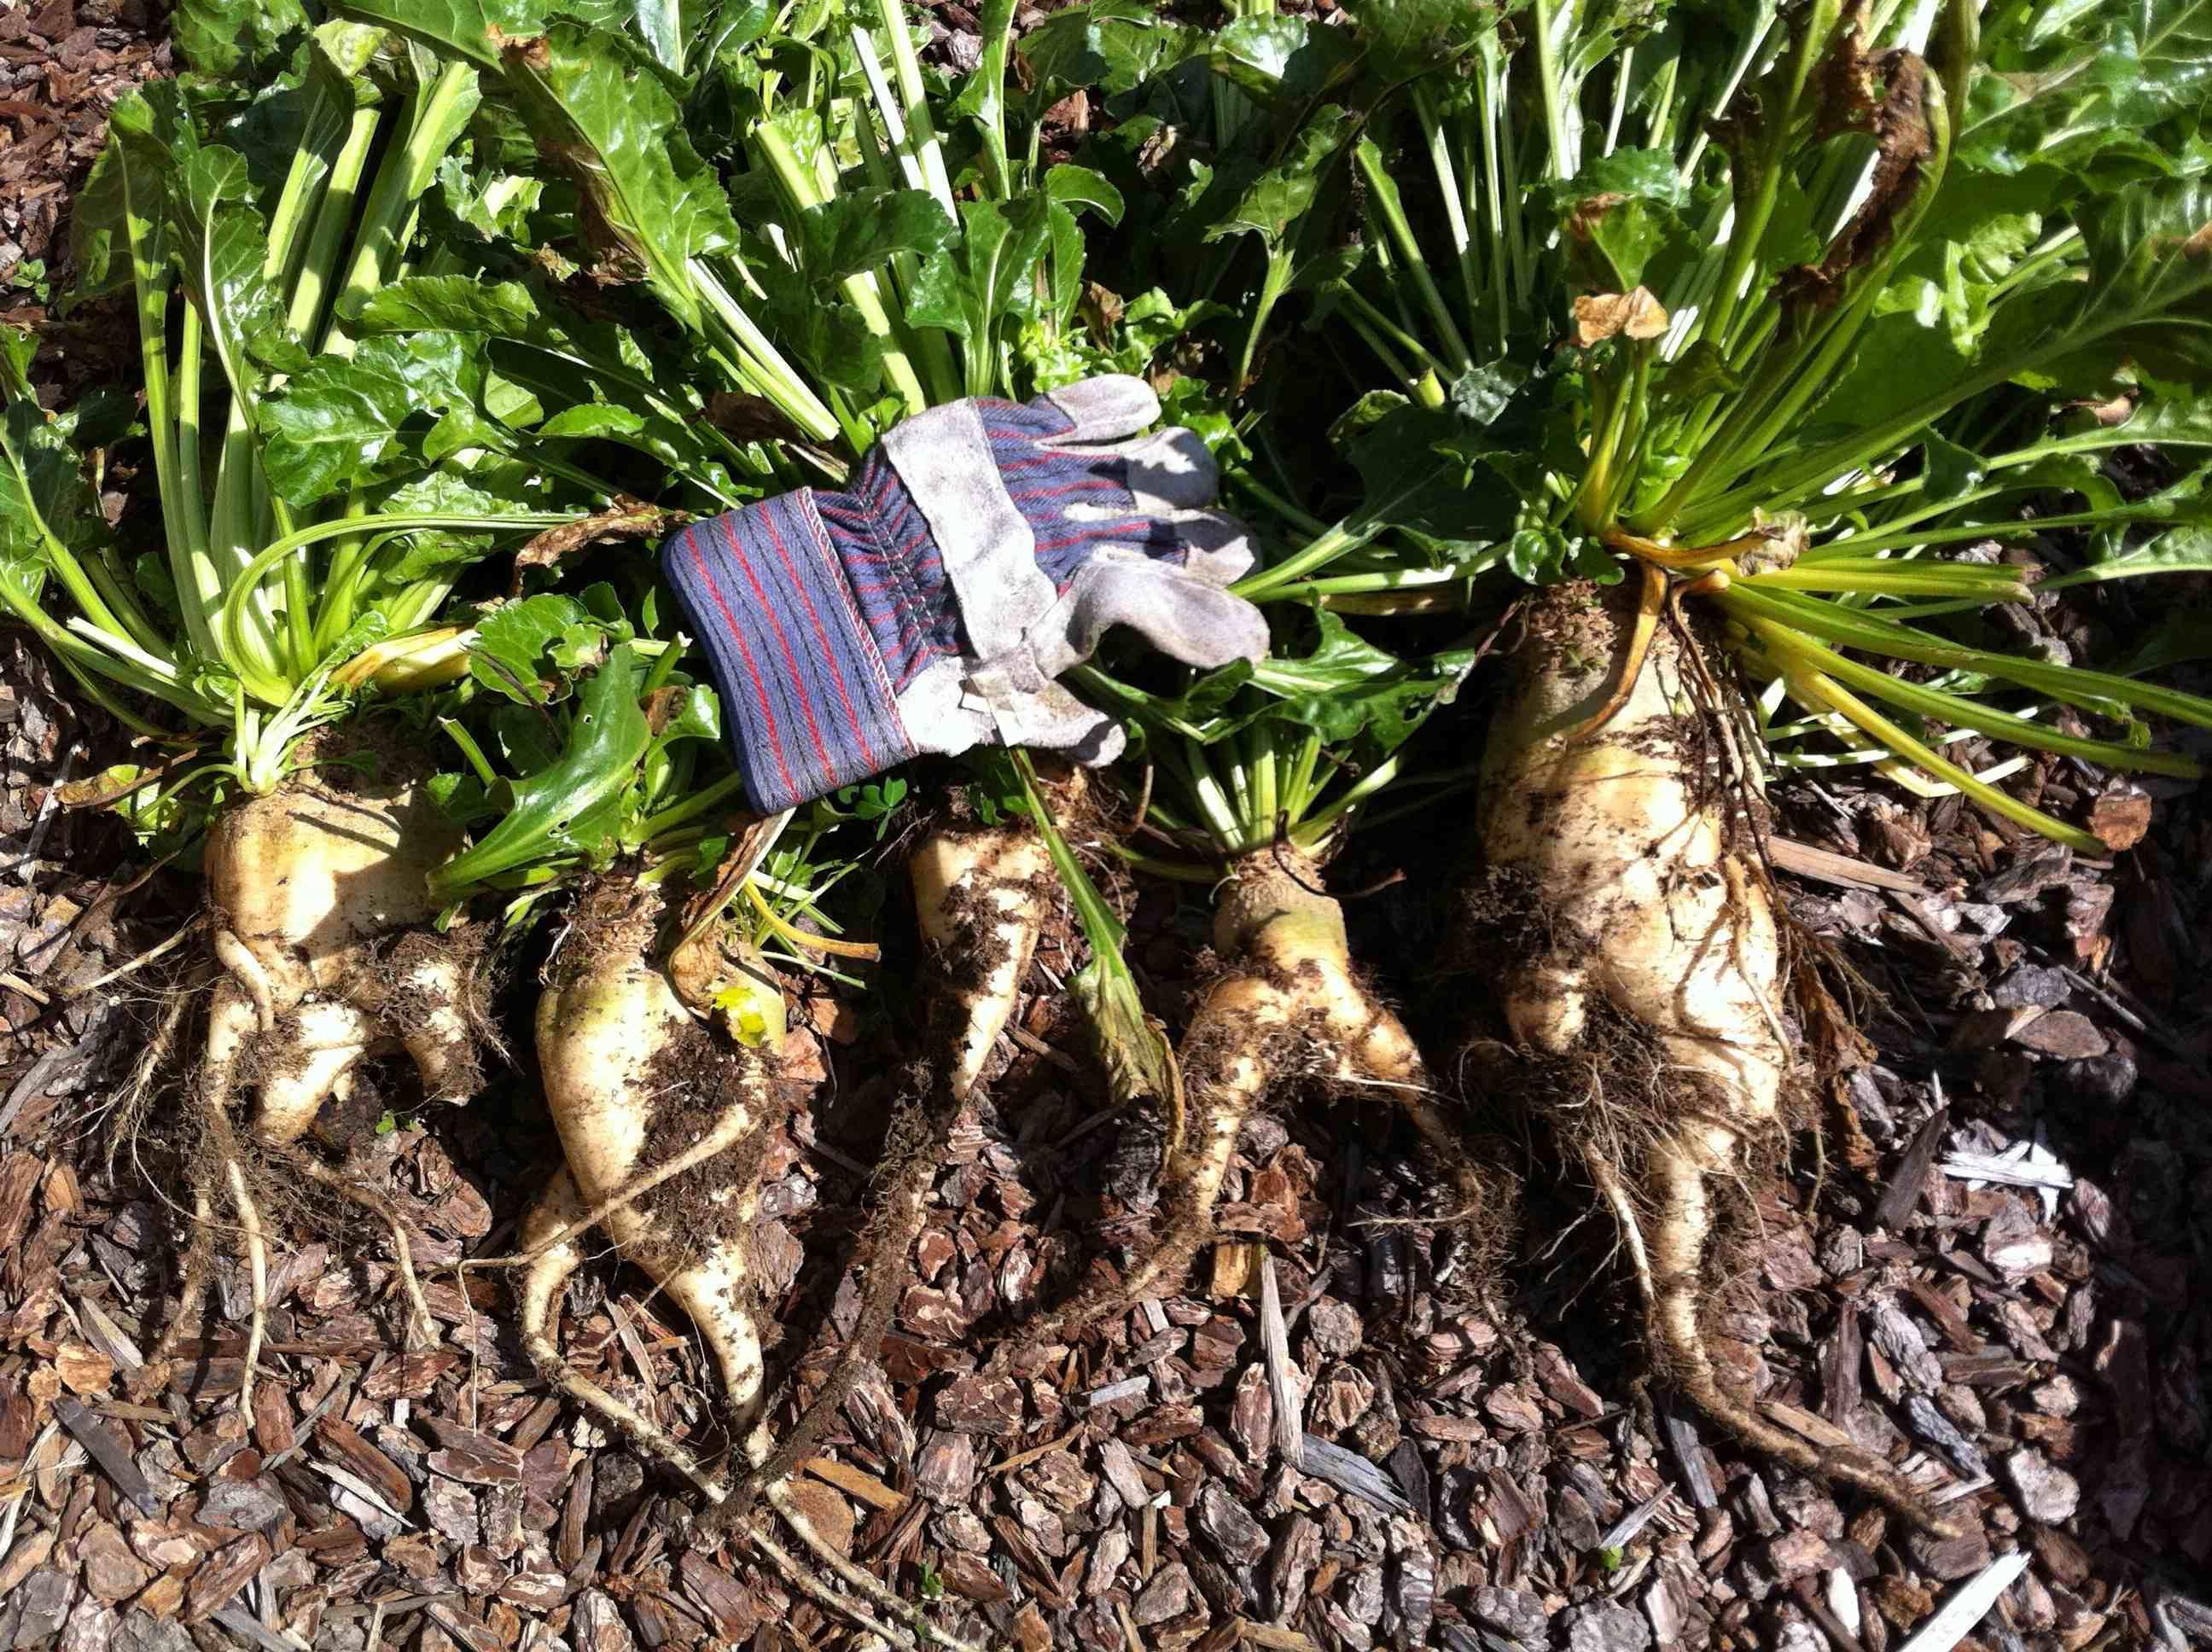 GMO crops vandalized in Oregon